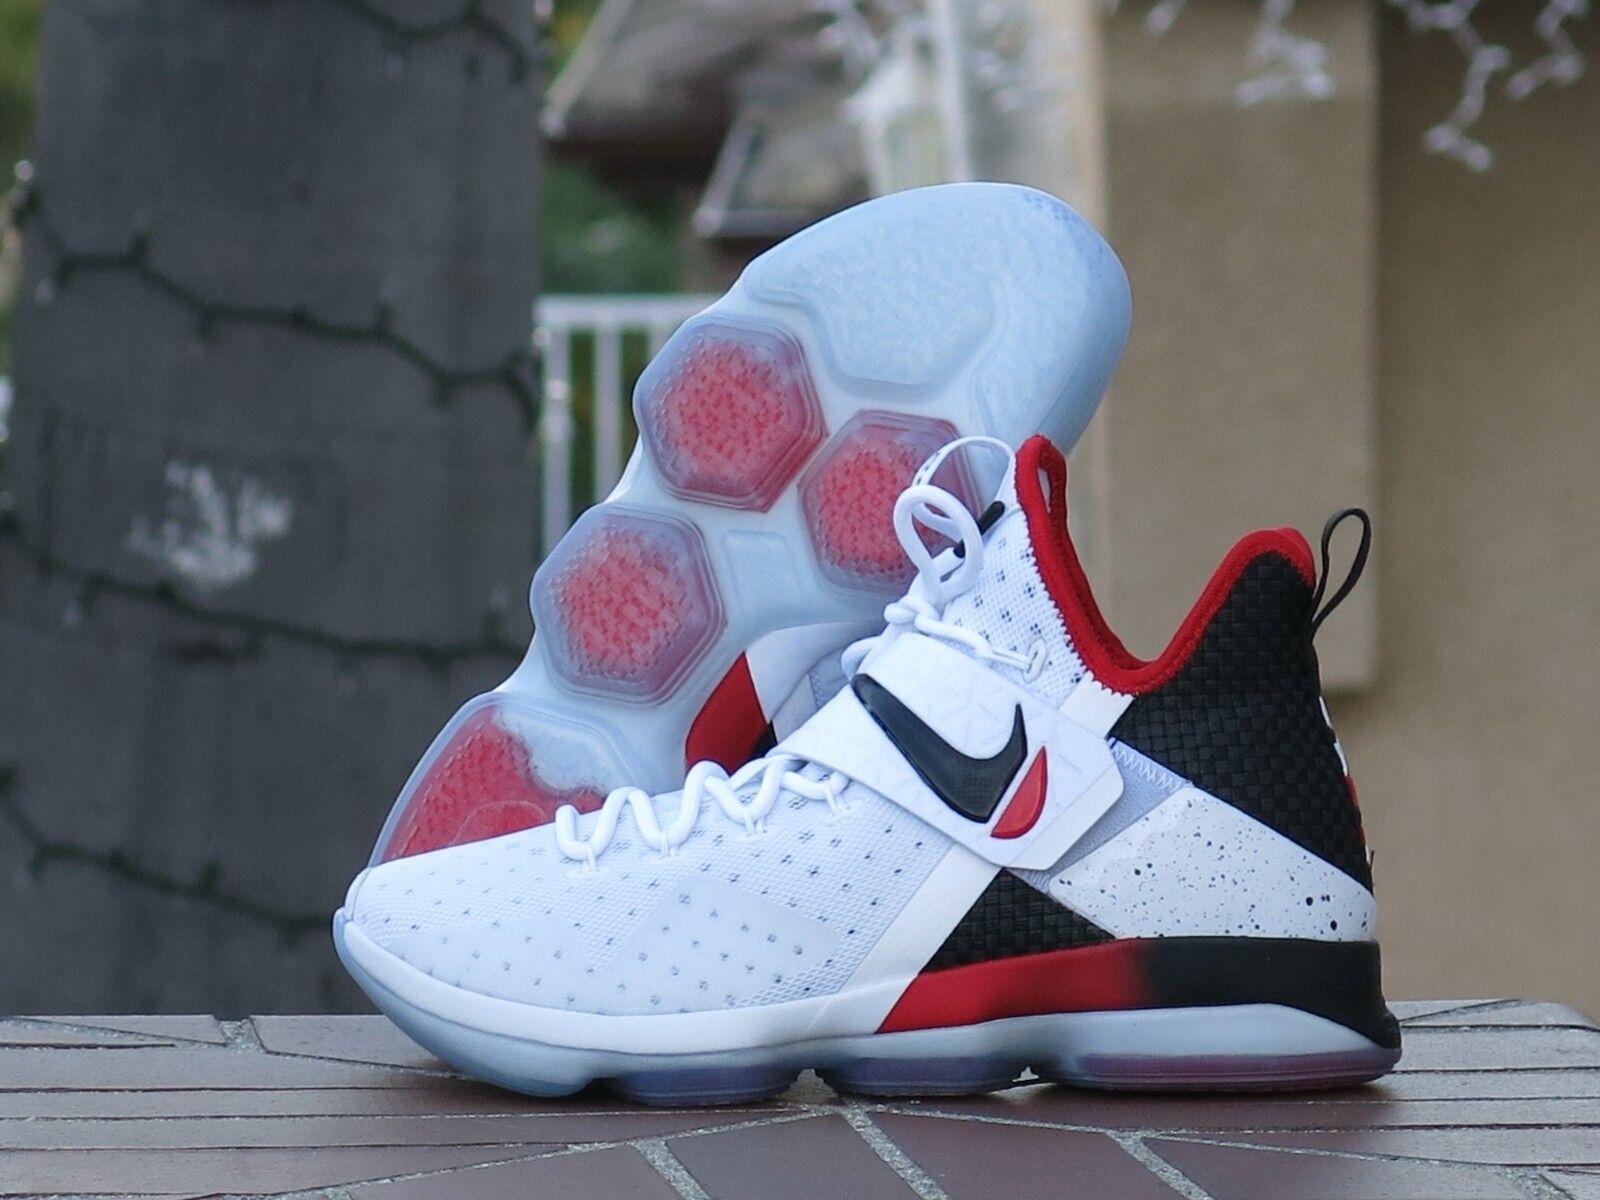 Nike Lebron XIV Men's Basketball Sneakers 852405-103